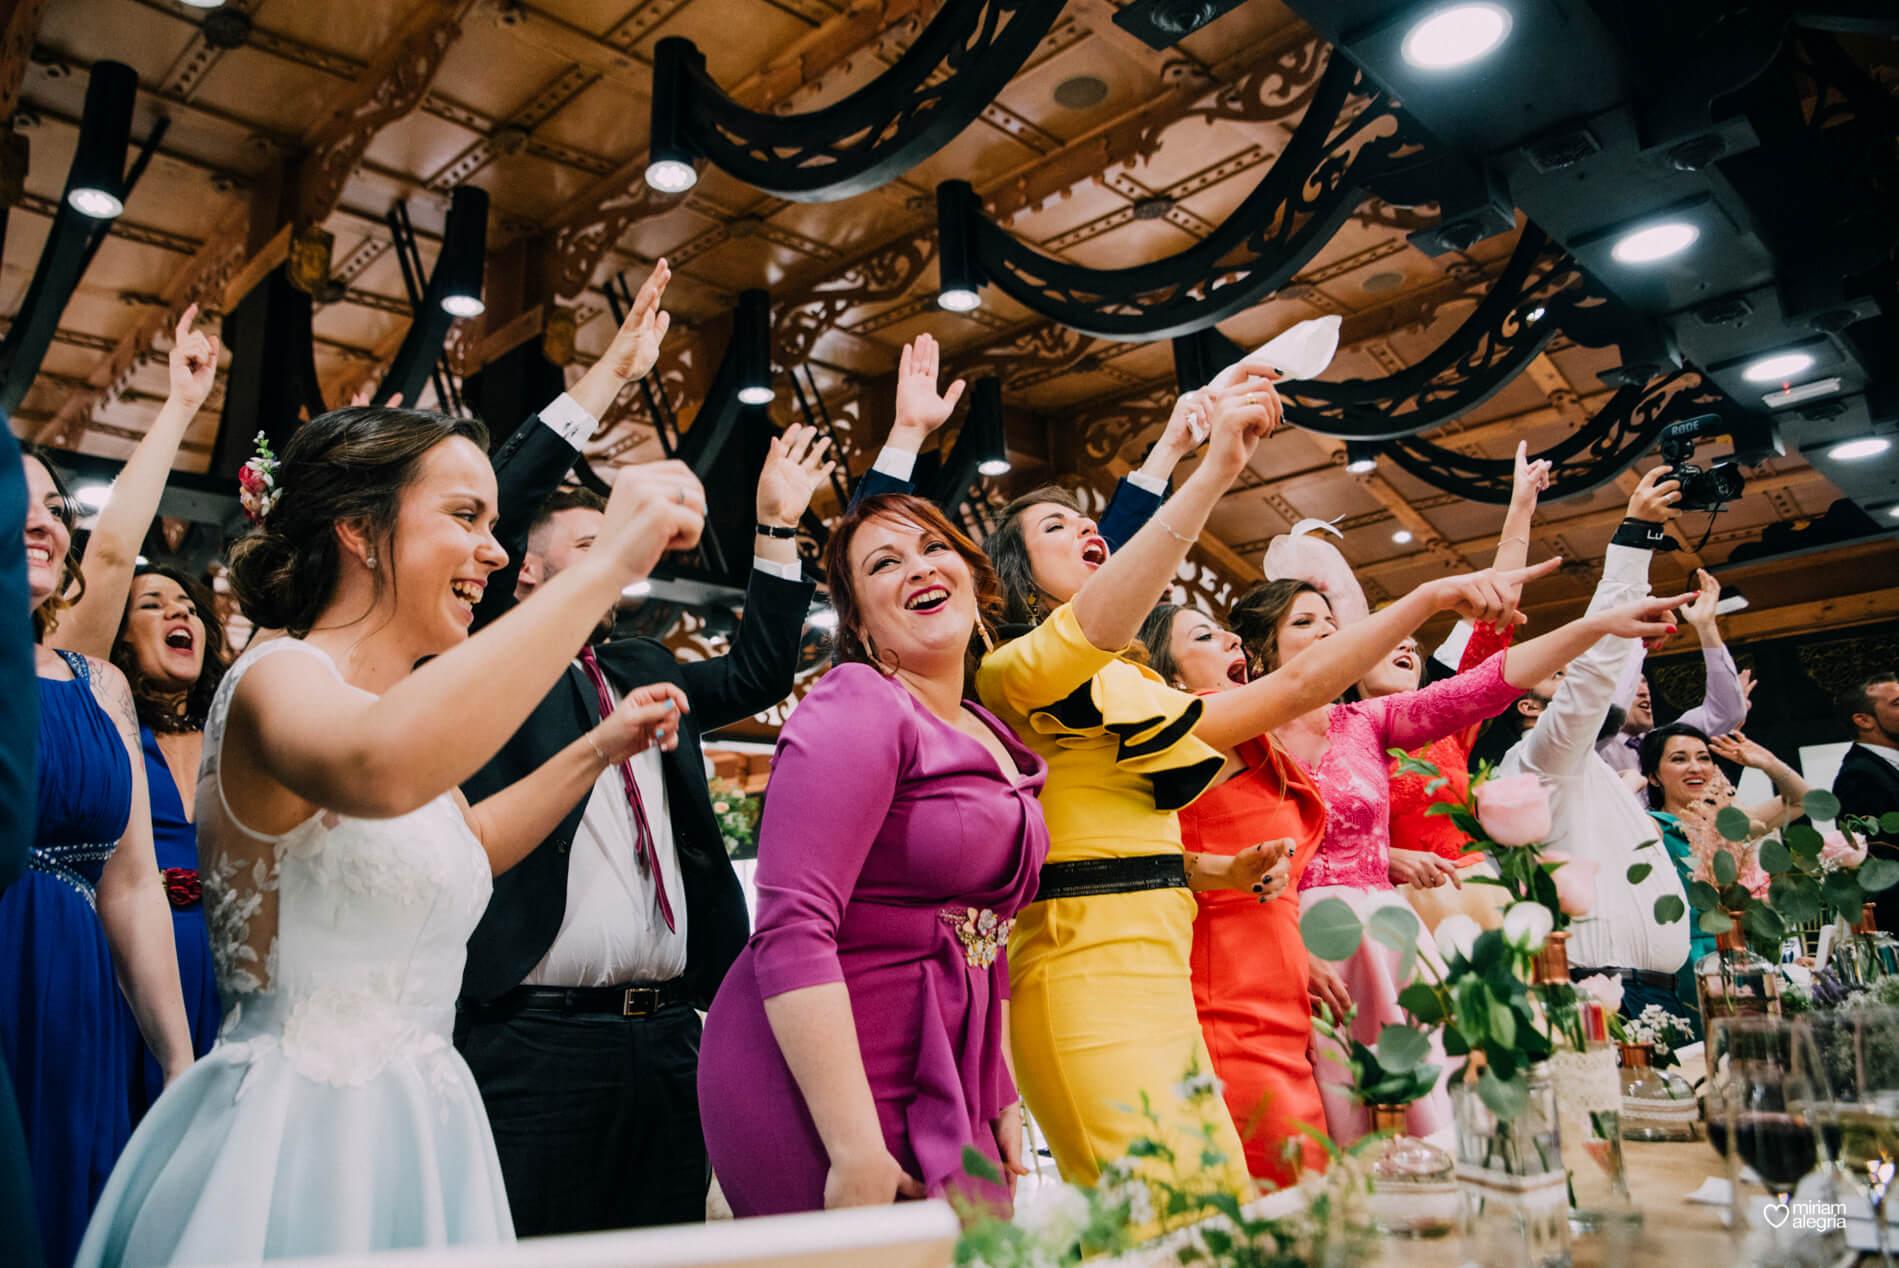 boda-en-finca-jurosa-miriam-alegria-112